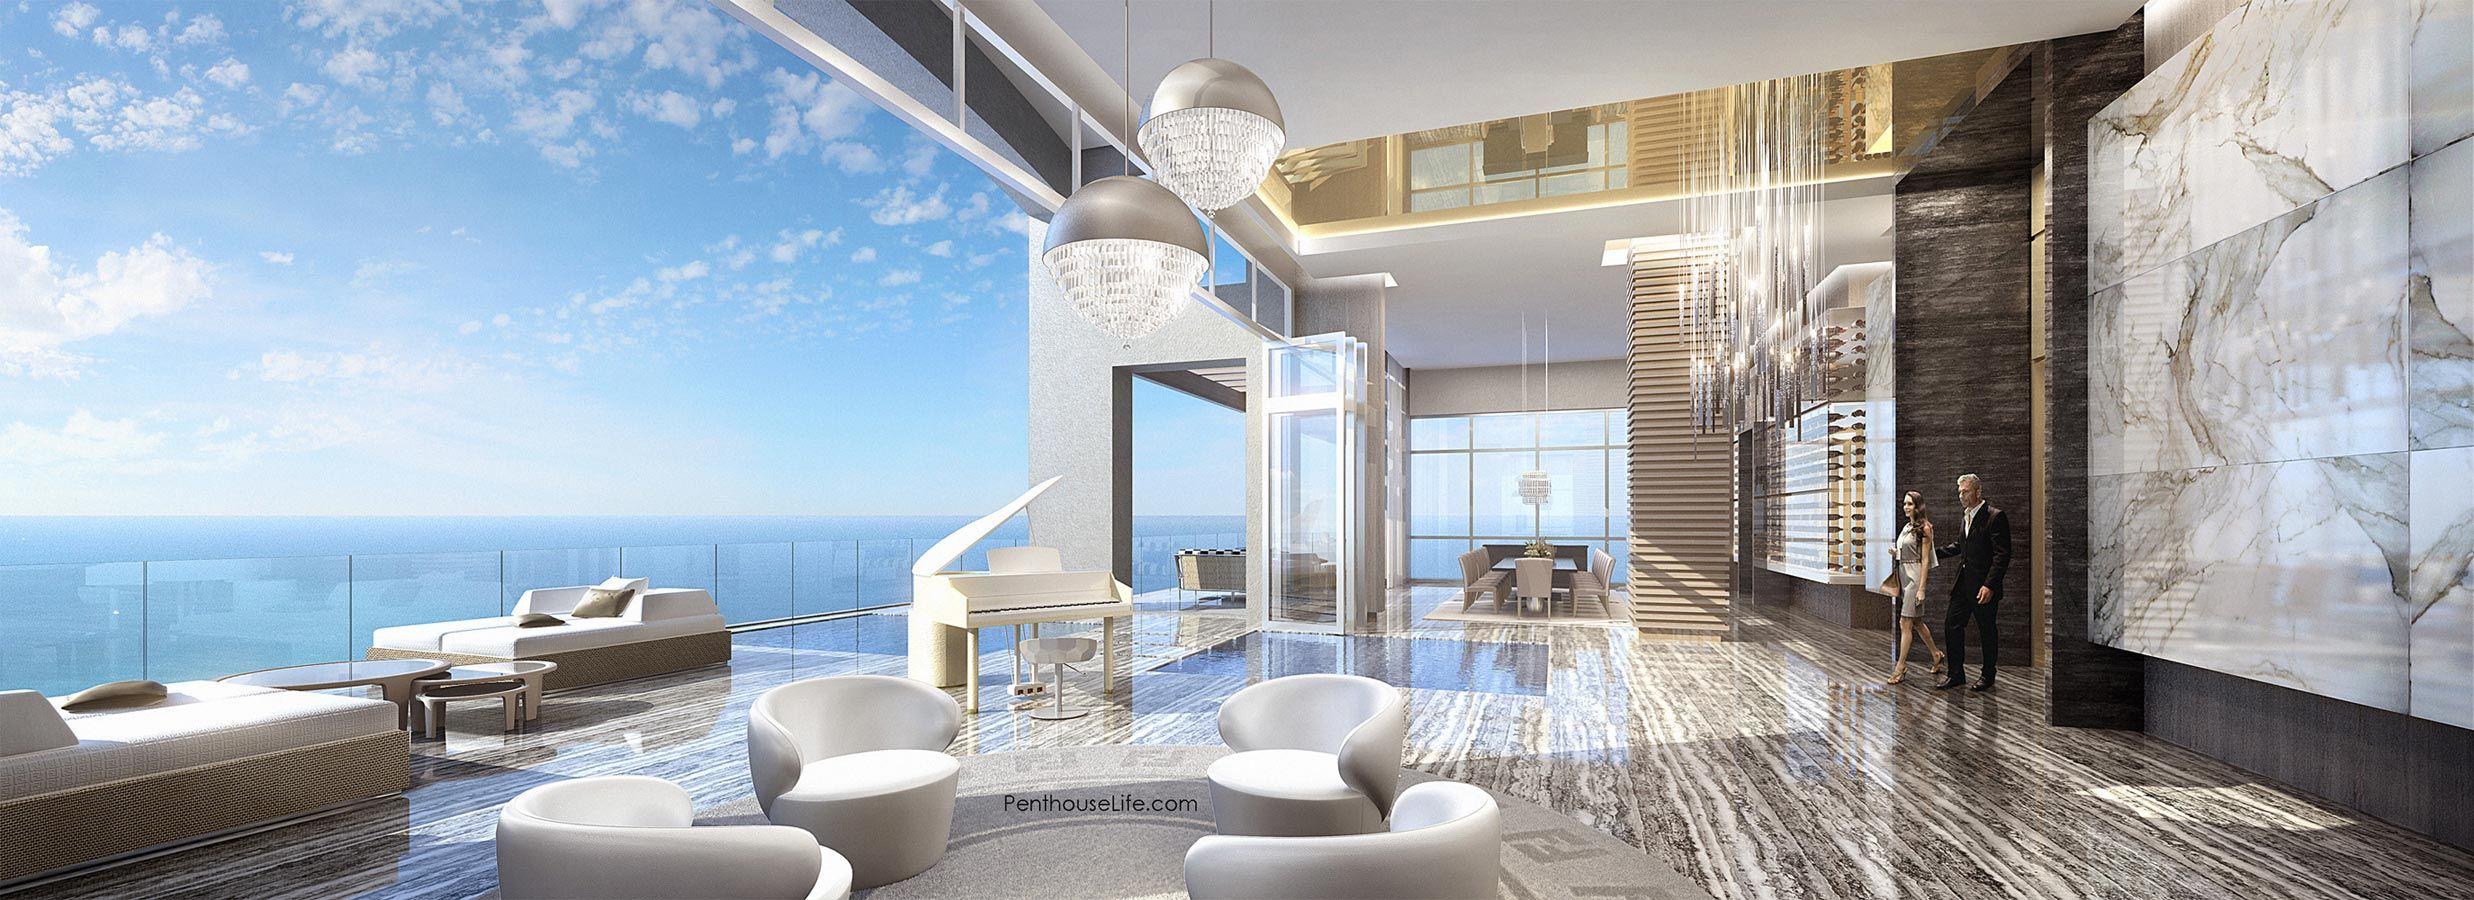 Jade Beach Penthouse PH4304 17001 COLLINS AV PH4304 Sunny Isles